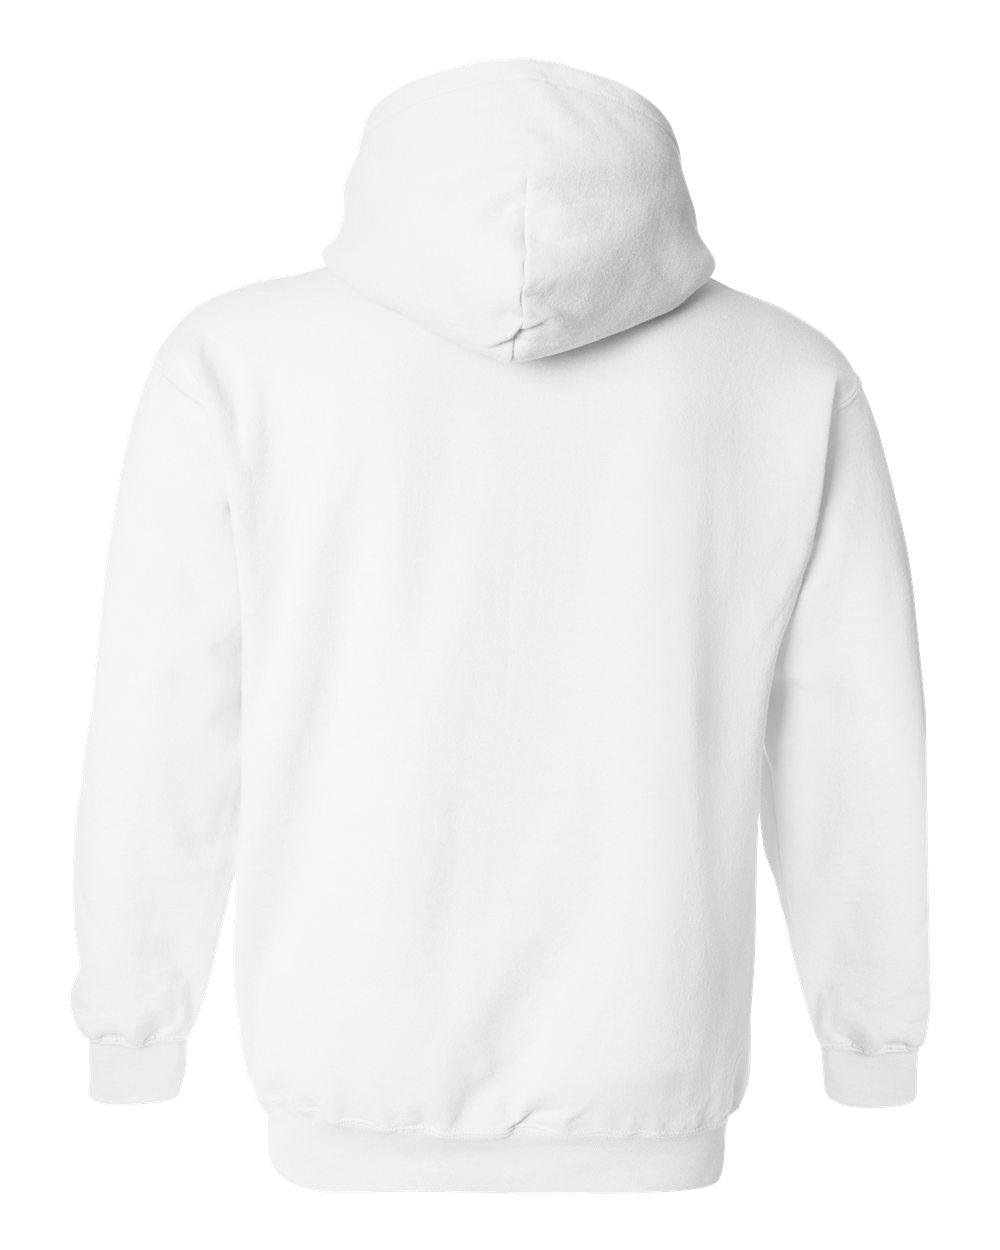 Gildan-Mens-Blank-Hoodie-Heavy-Blend-Hooded-Sweatshirt-Solid-18500-up-to-5XL thumbnail 102